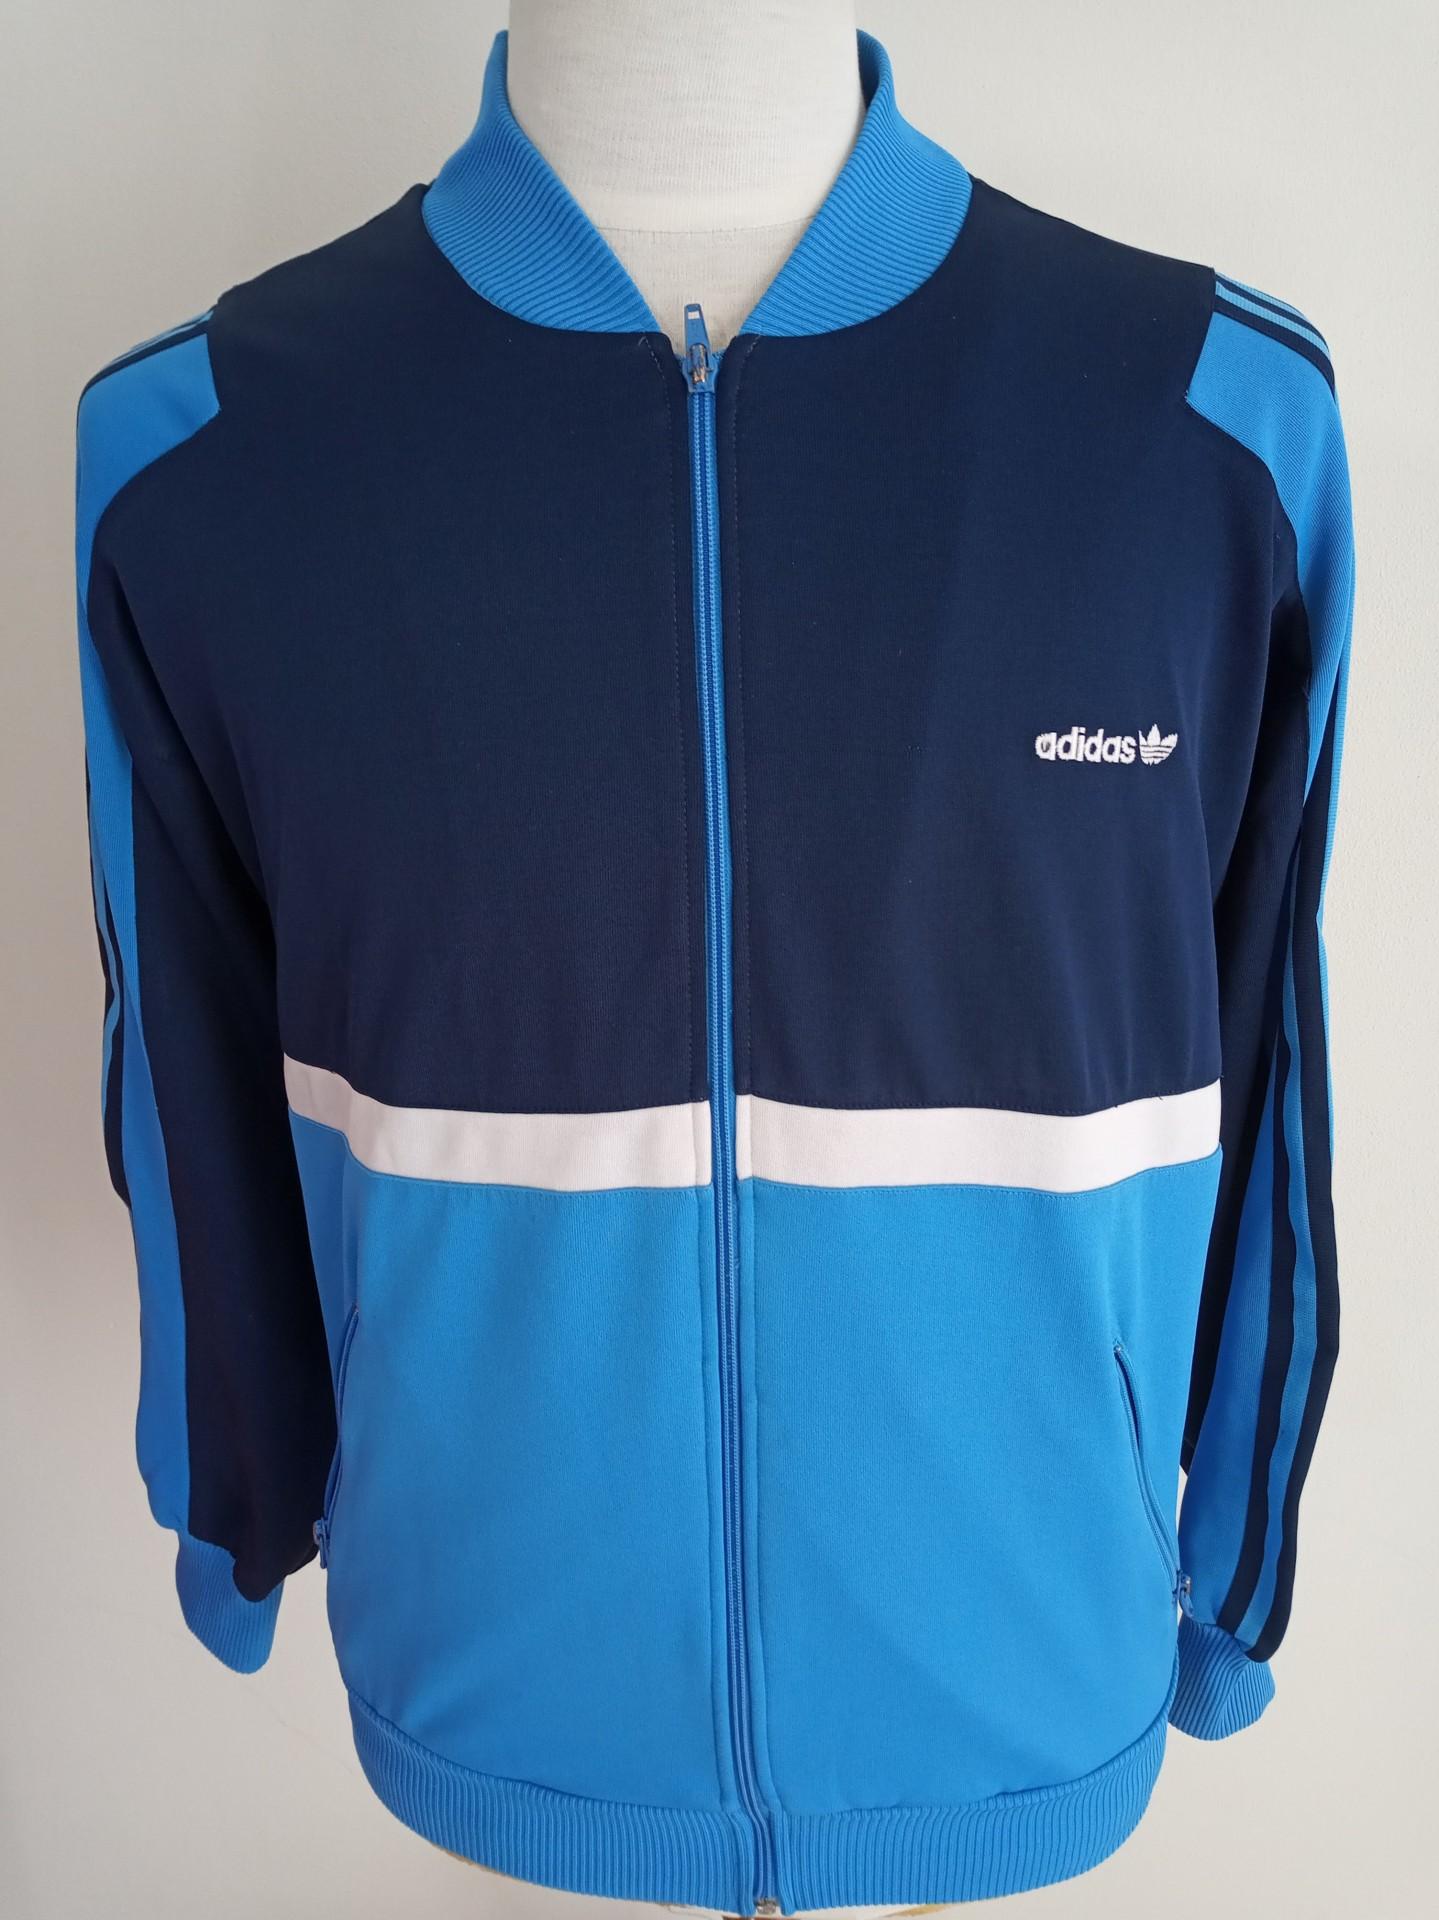 Vintage Track Top Adidas (M) Blue White Jacket Antigo Casaco | Vintage Sports Classic Football Shirts Jerseys Camisolas Futebol NBA